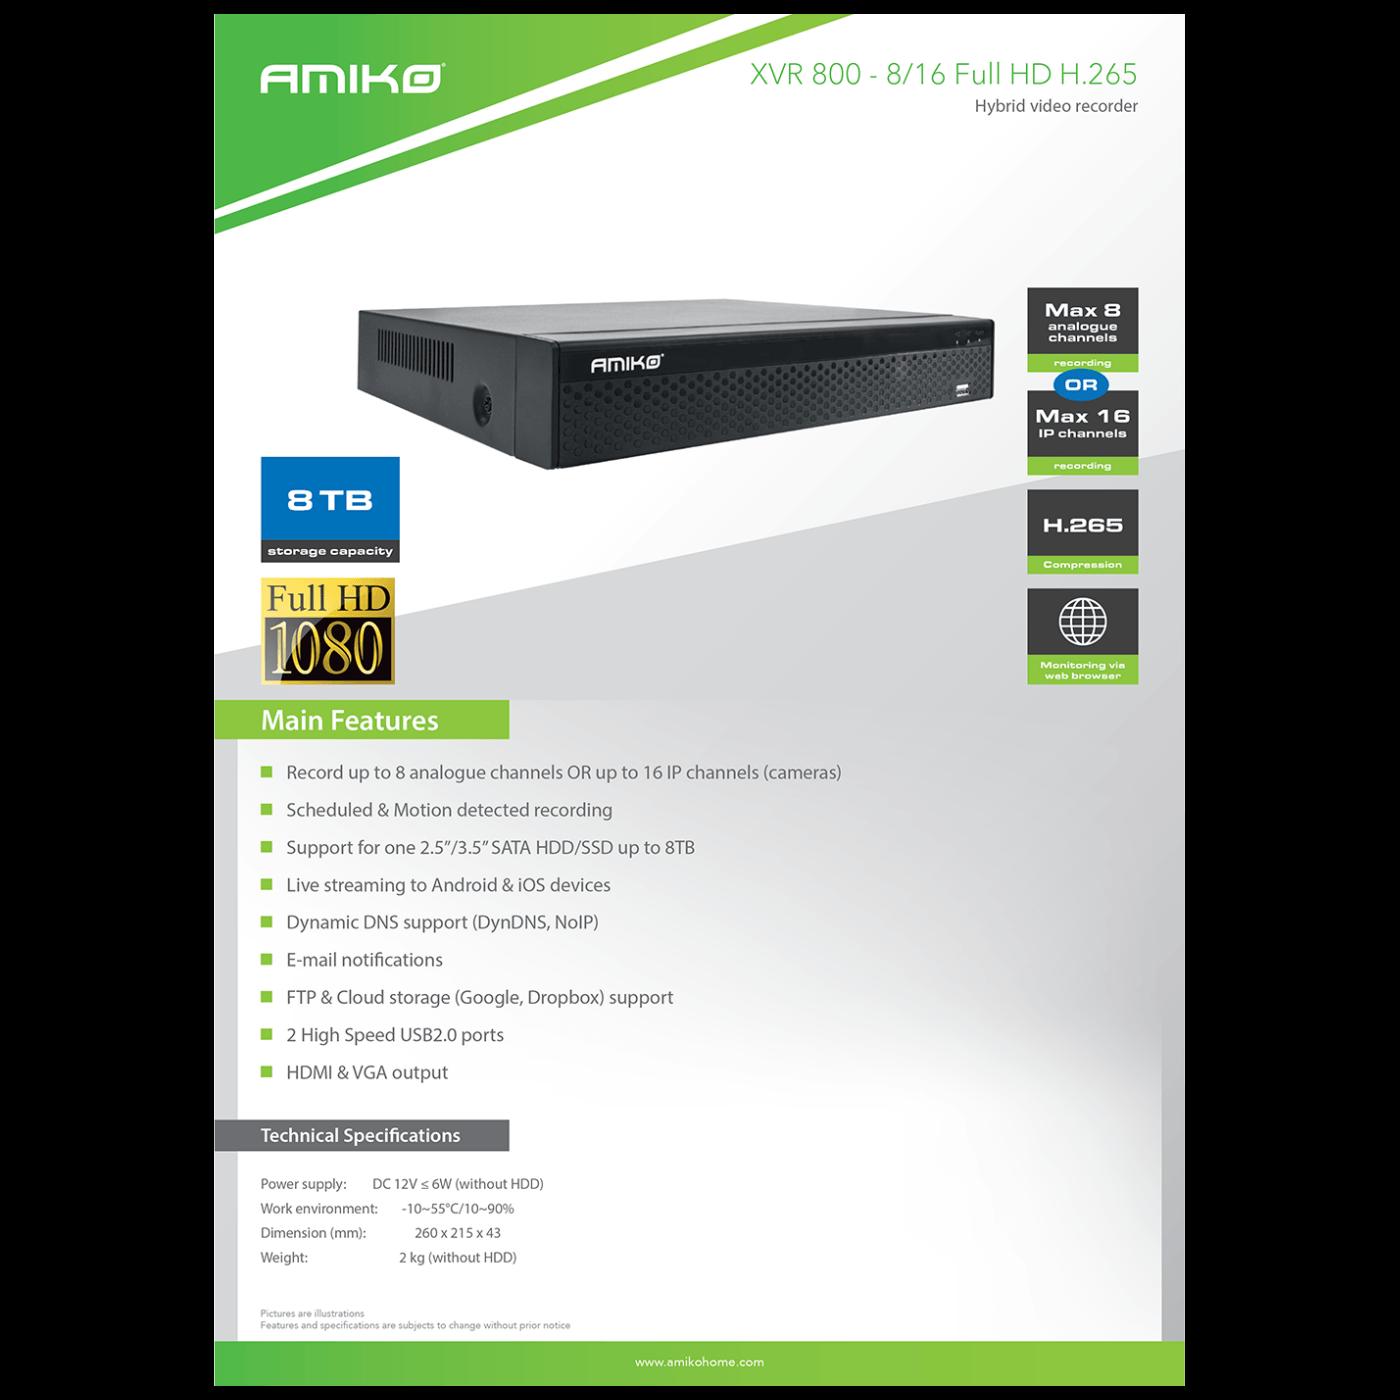 XVR 800 8/16 FULLHD H.265+